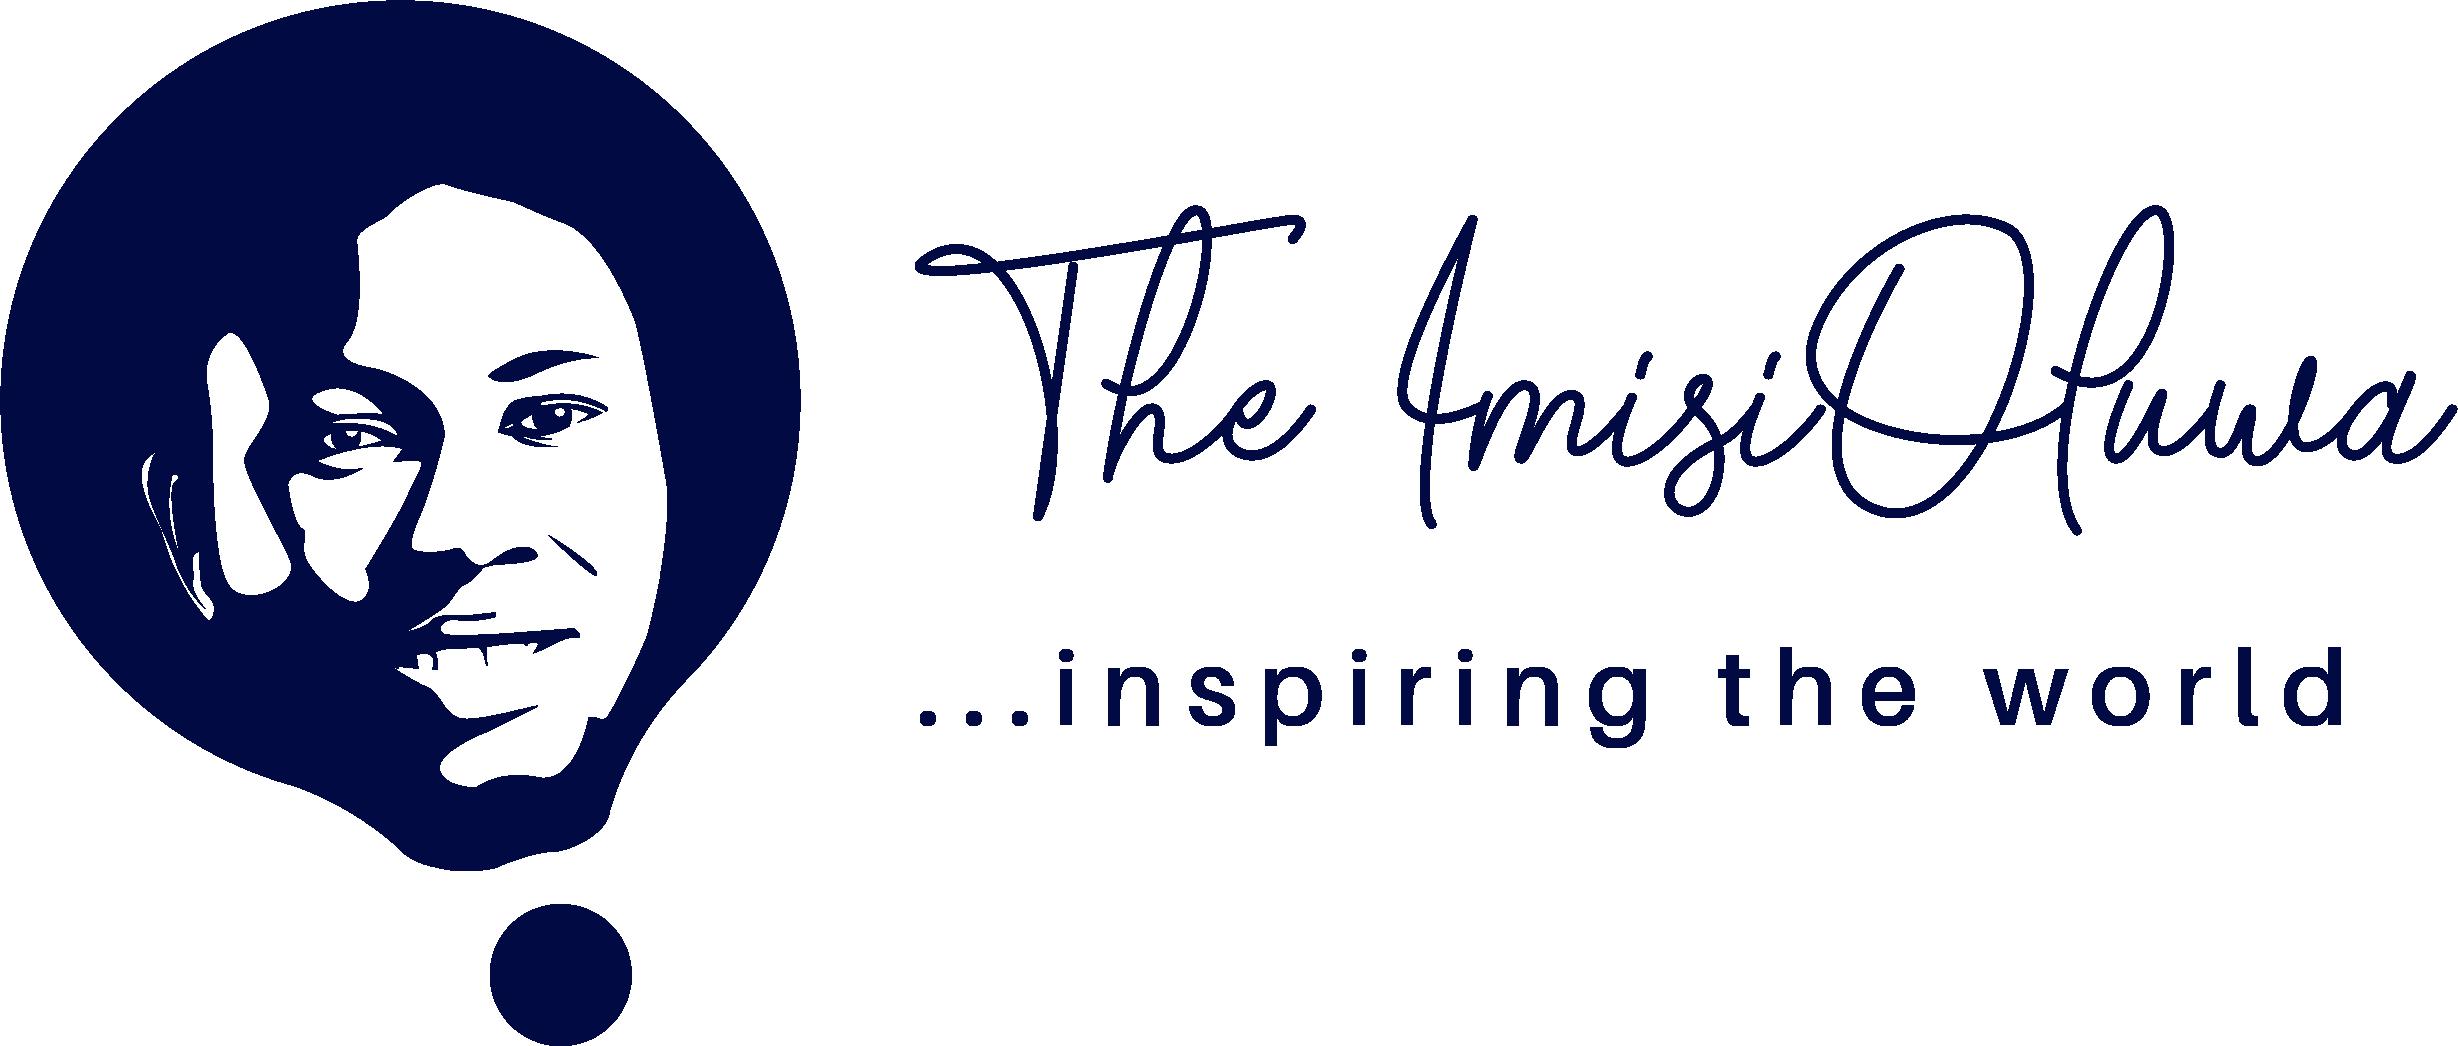 THE IMISIOLUWA